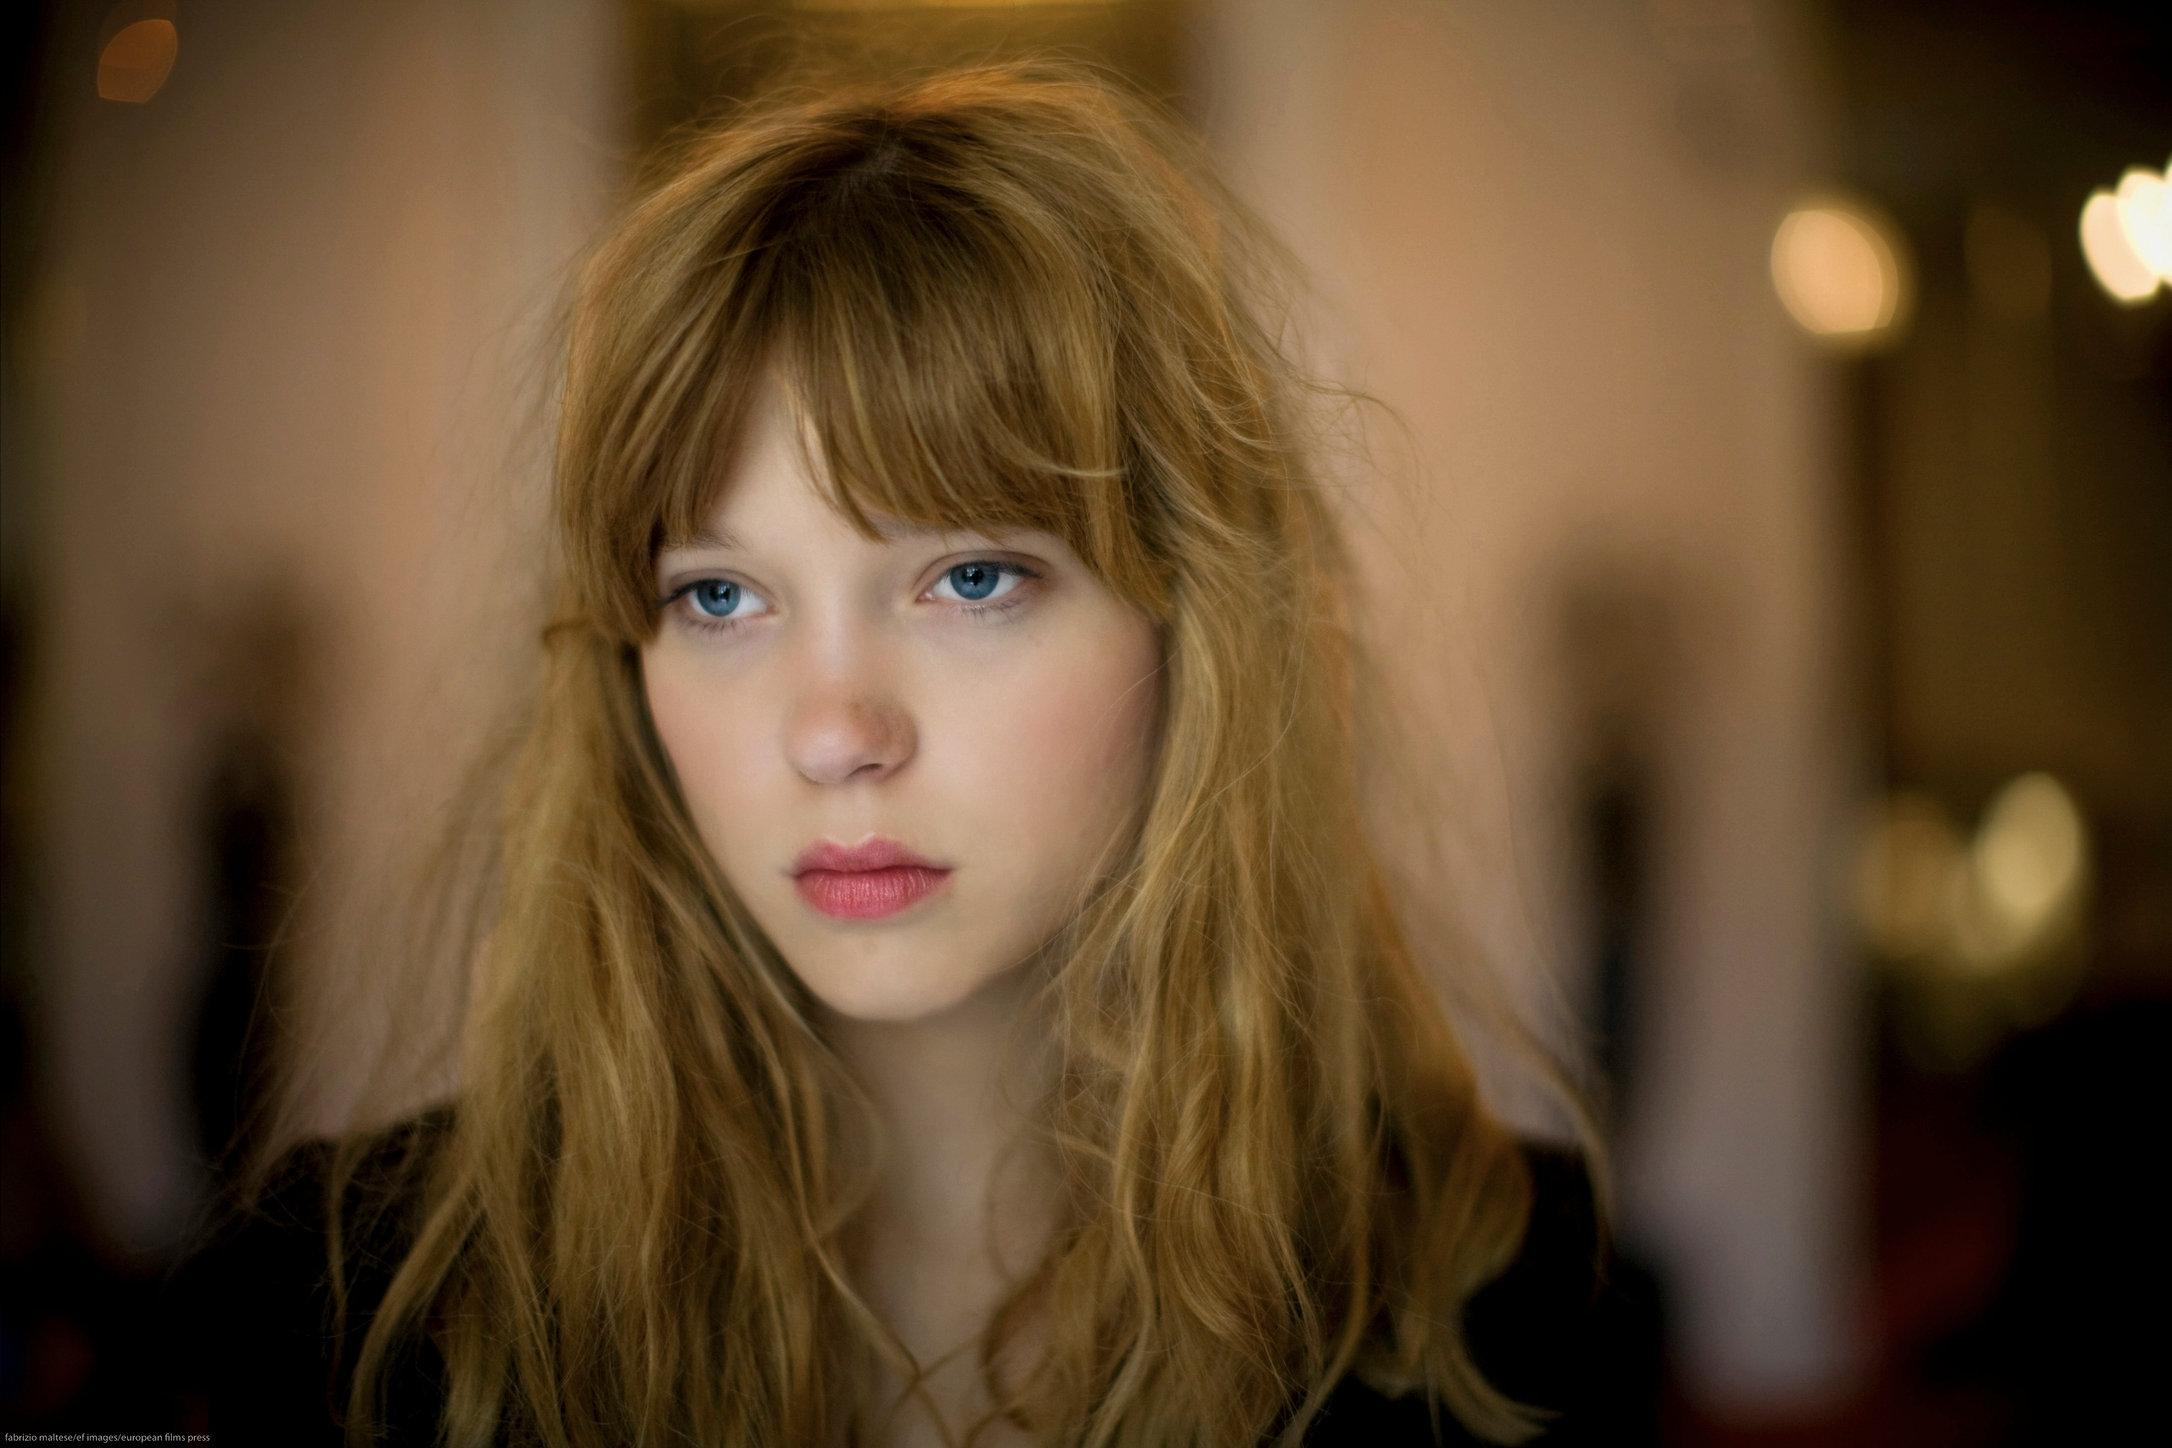 lea seydoux, actress